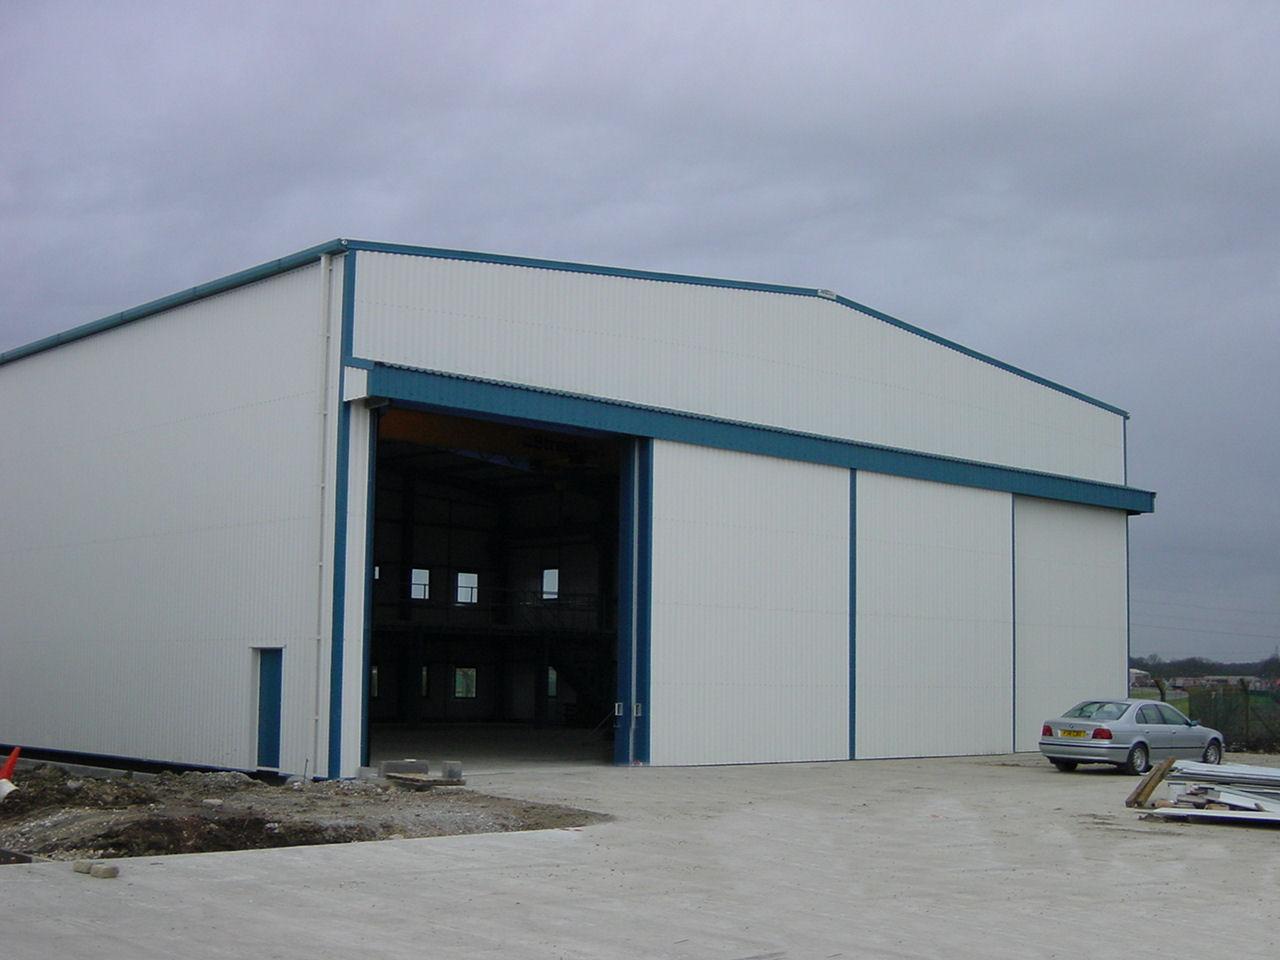 Discovery Yachts Industrial Factory Buildings By Reidsteel